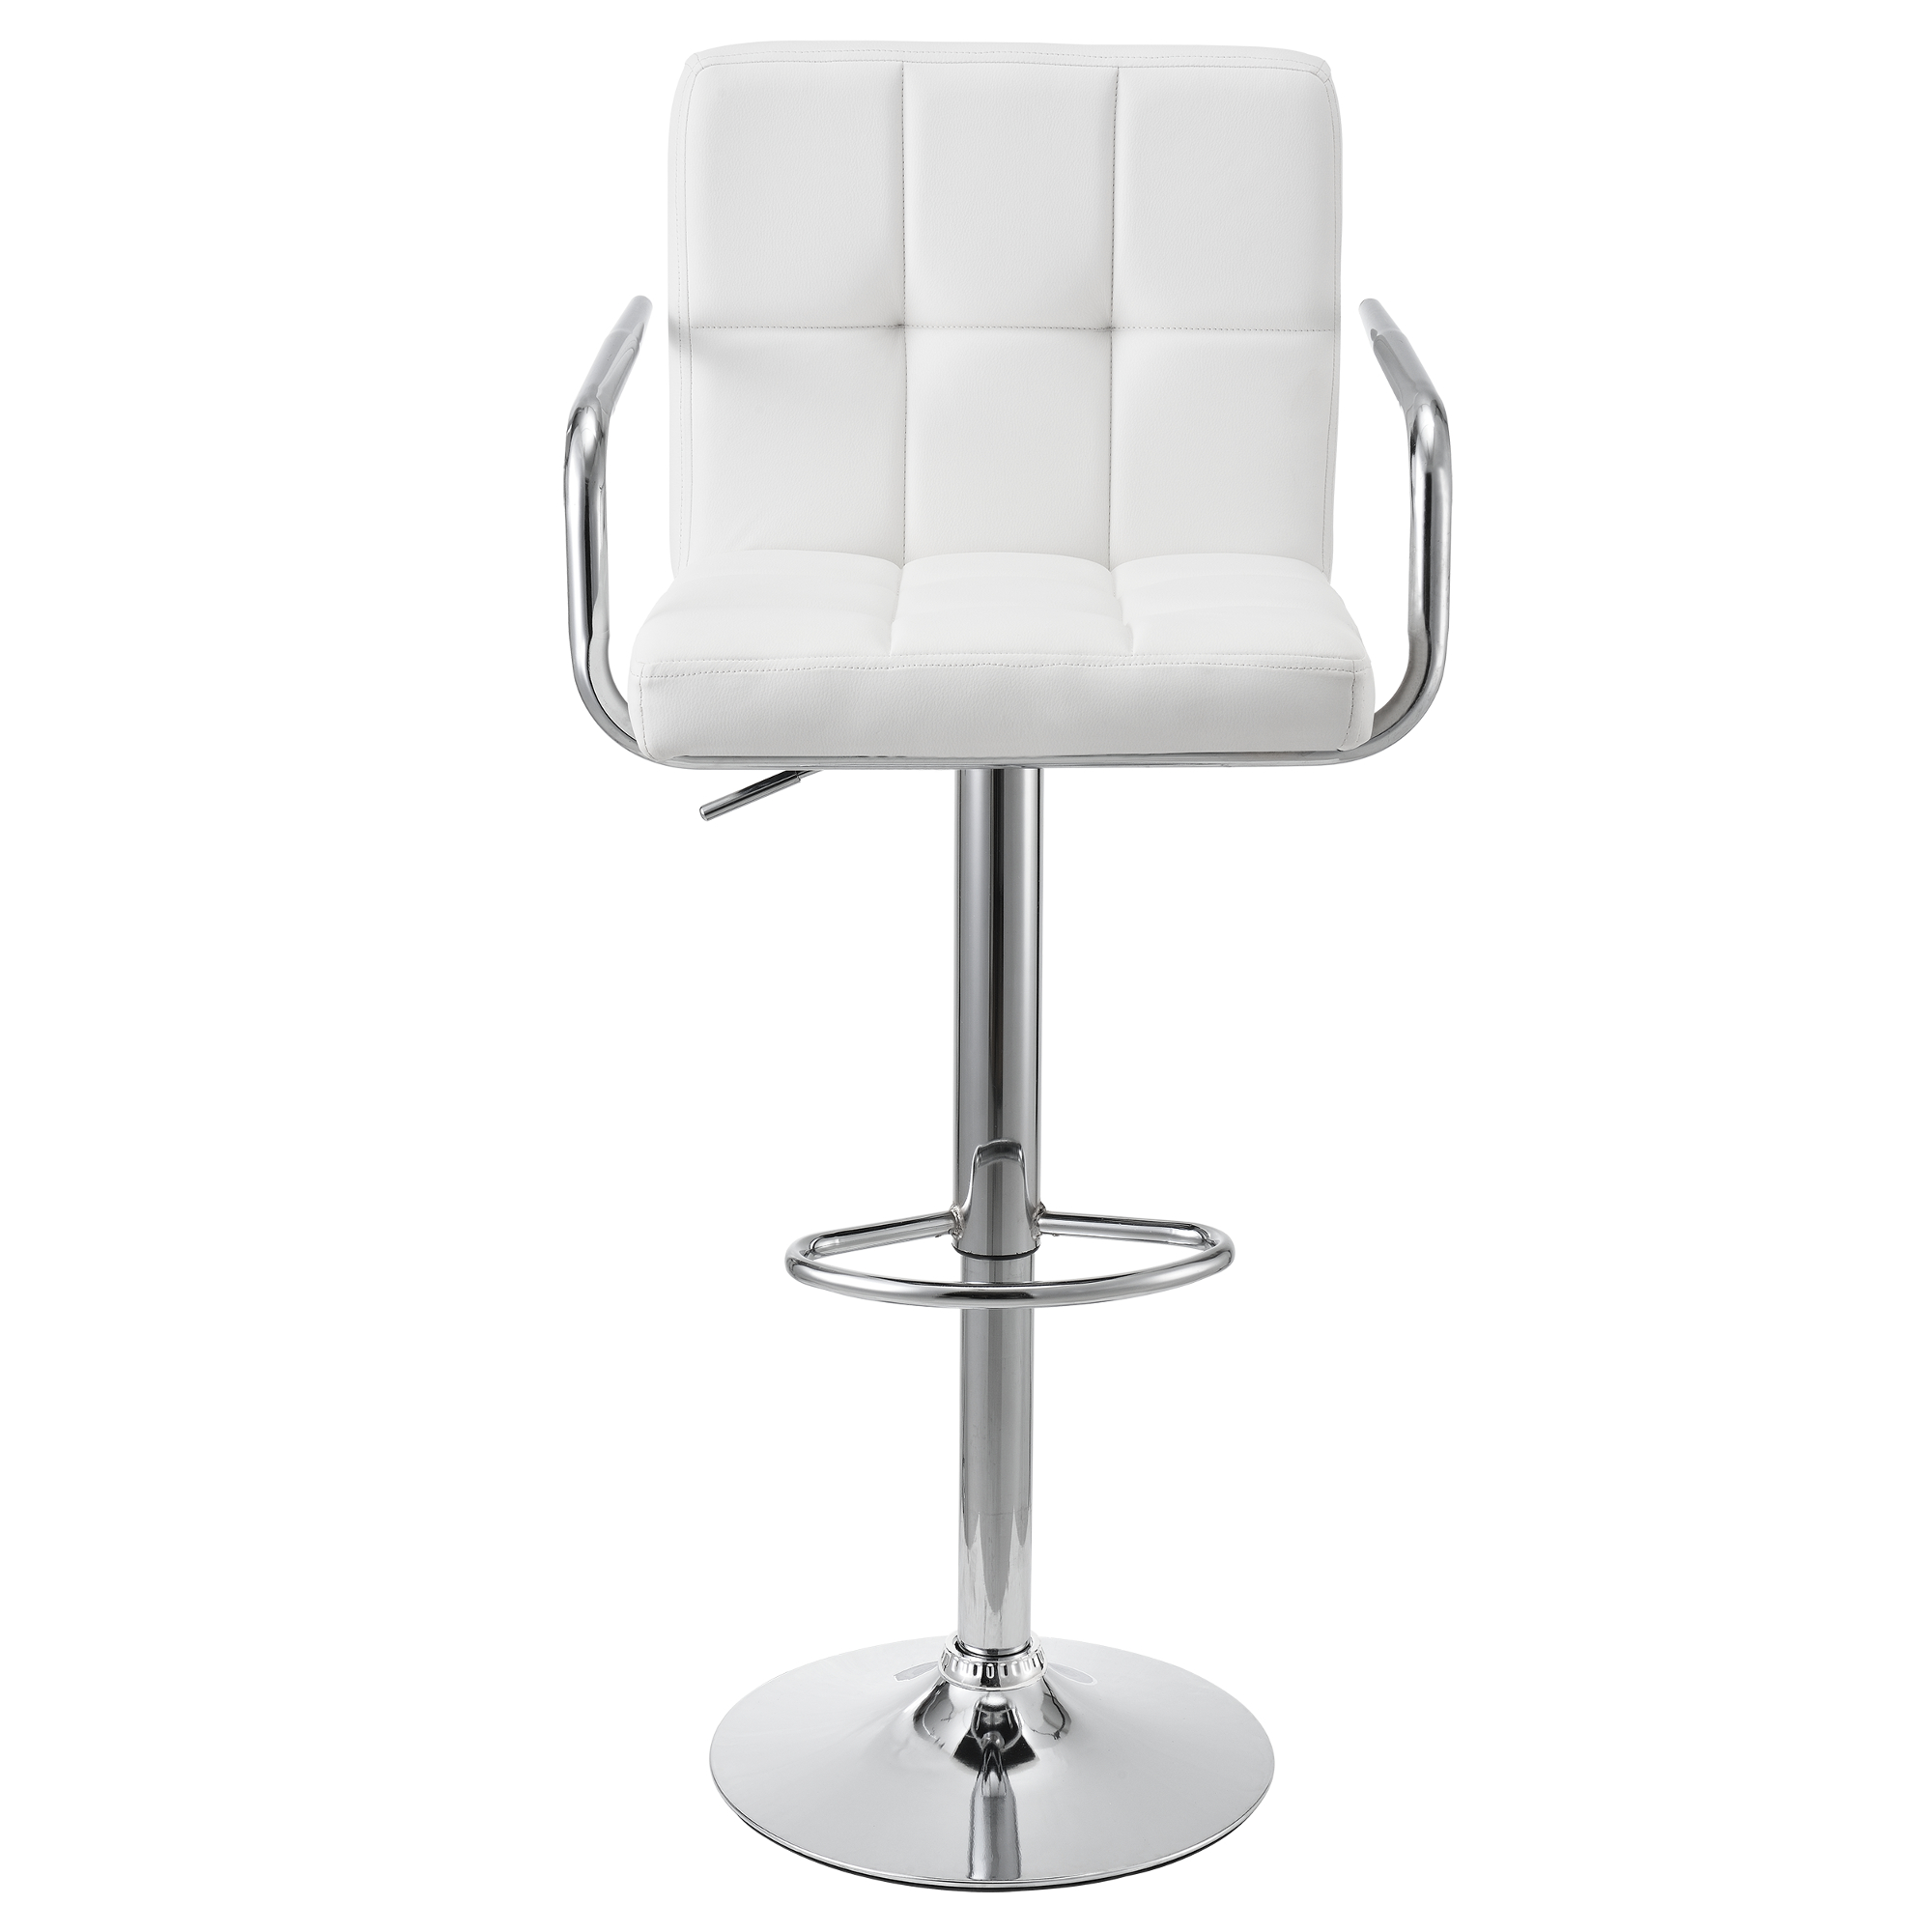 barhocker wei 2er set mit lehne tresenhocker barstuhl tresen hocker ebay. Black Bedroom Furniture Sets. Home Design Ideas